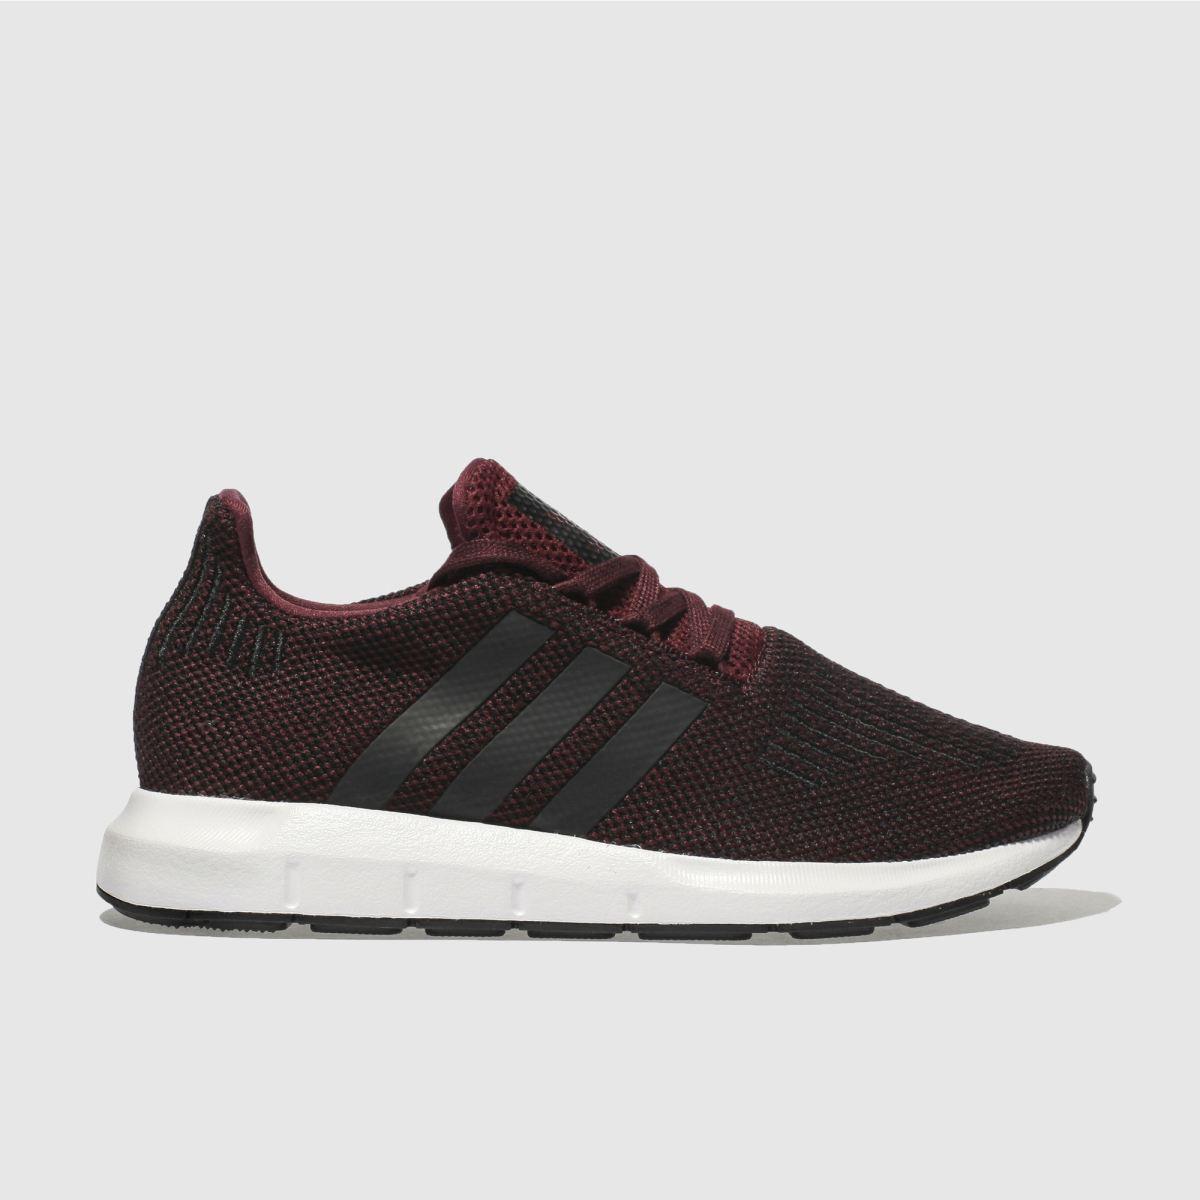 Adidas Burgundy Swift Run Unisex Youth Youth